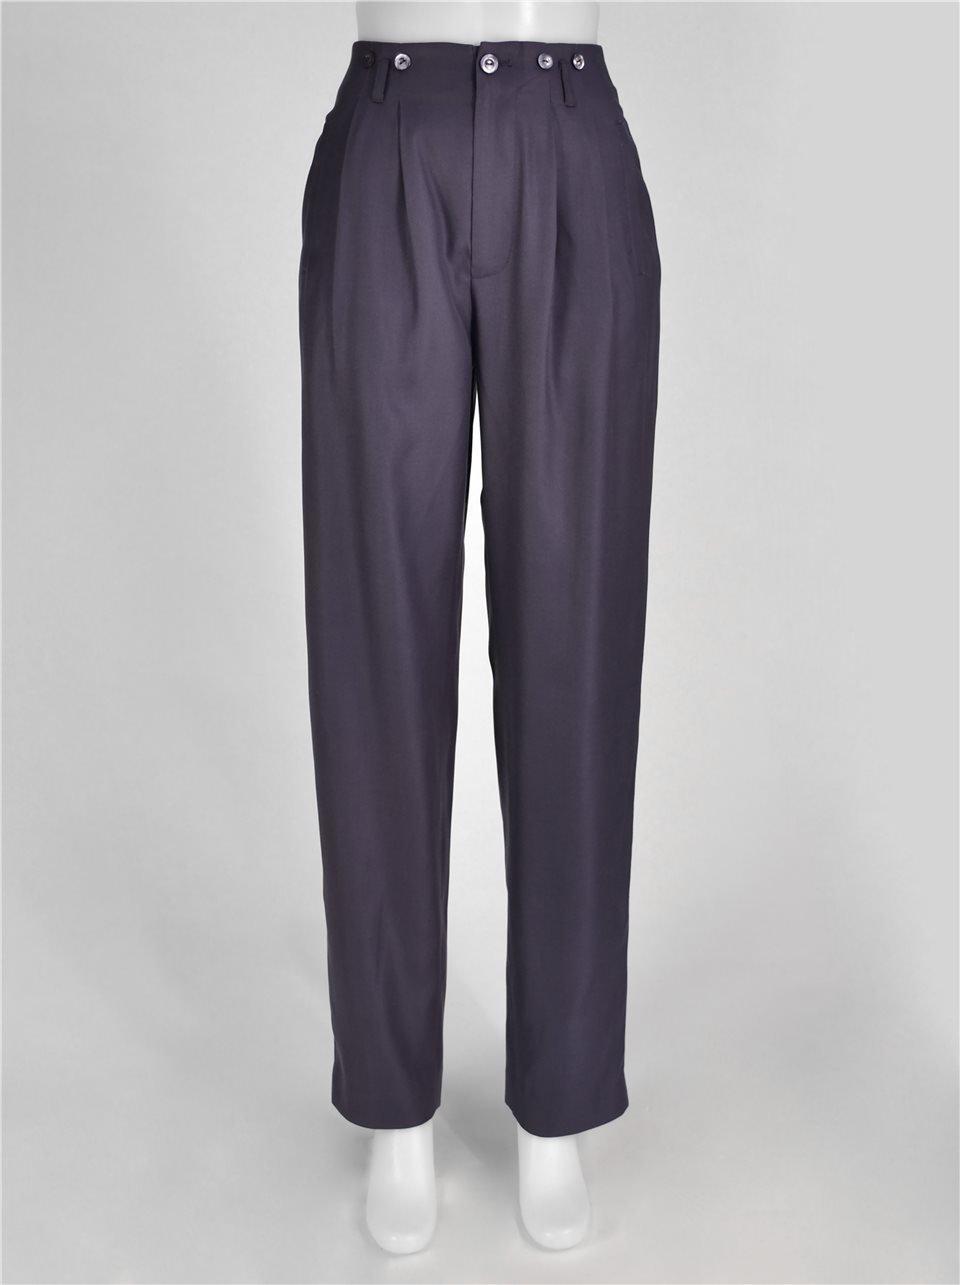 Glamour Pants Plum 2